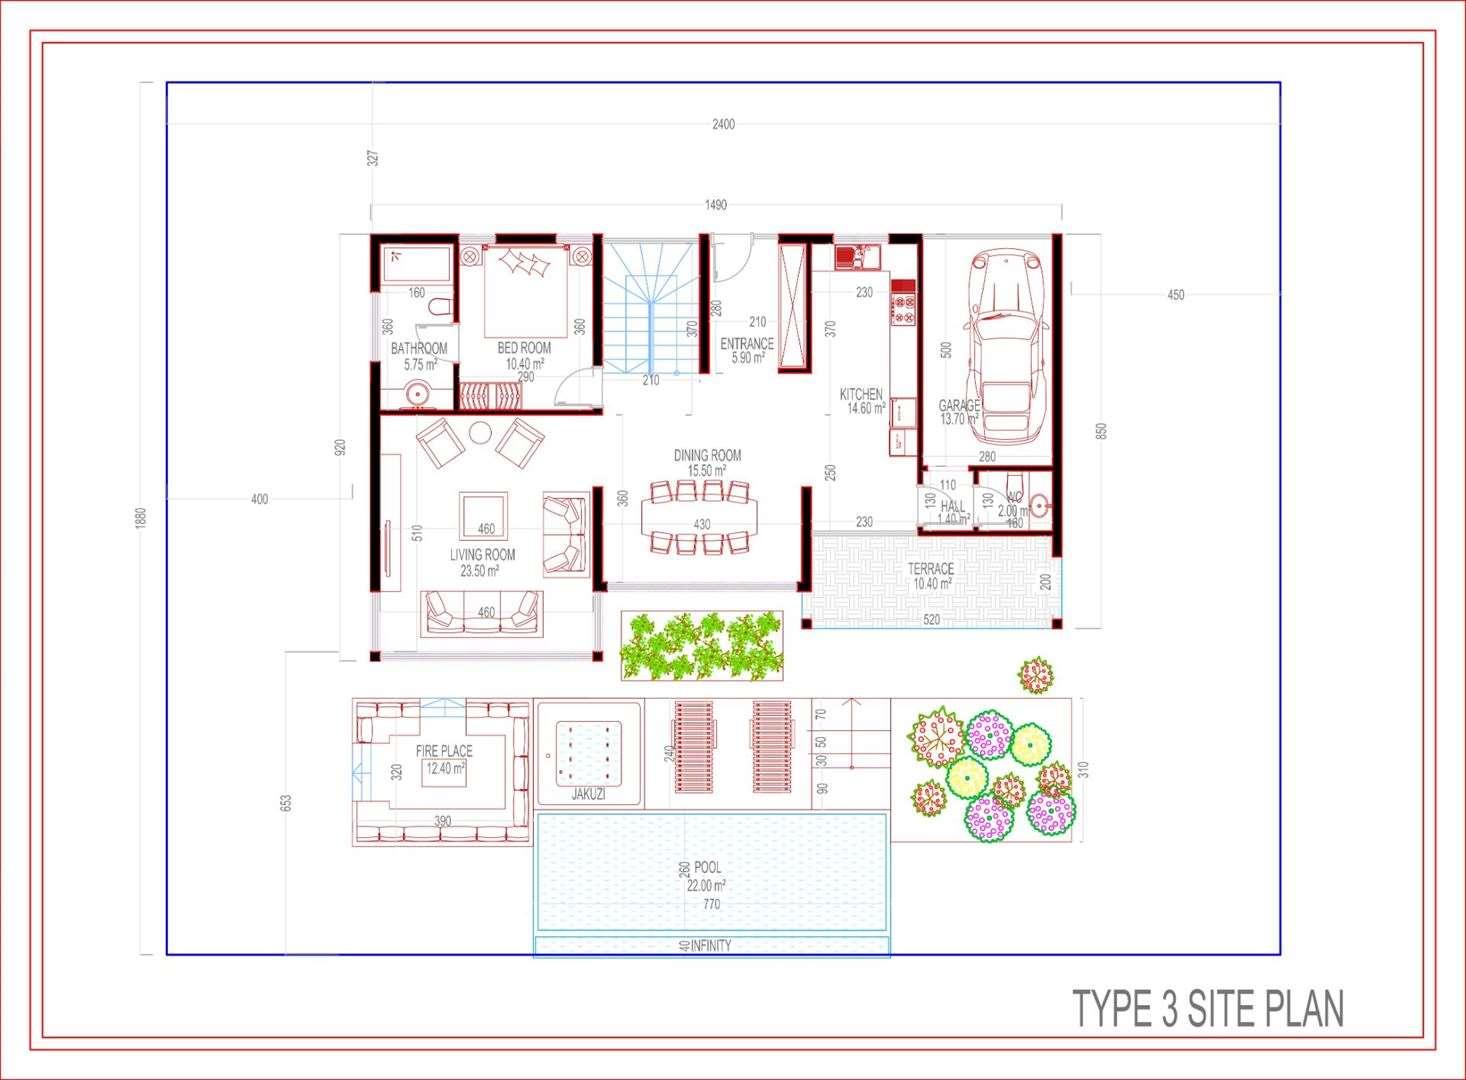 Type 3 Villa Site Plan